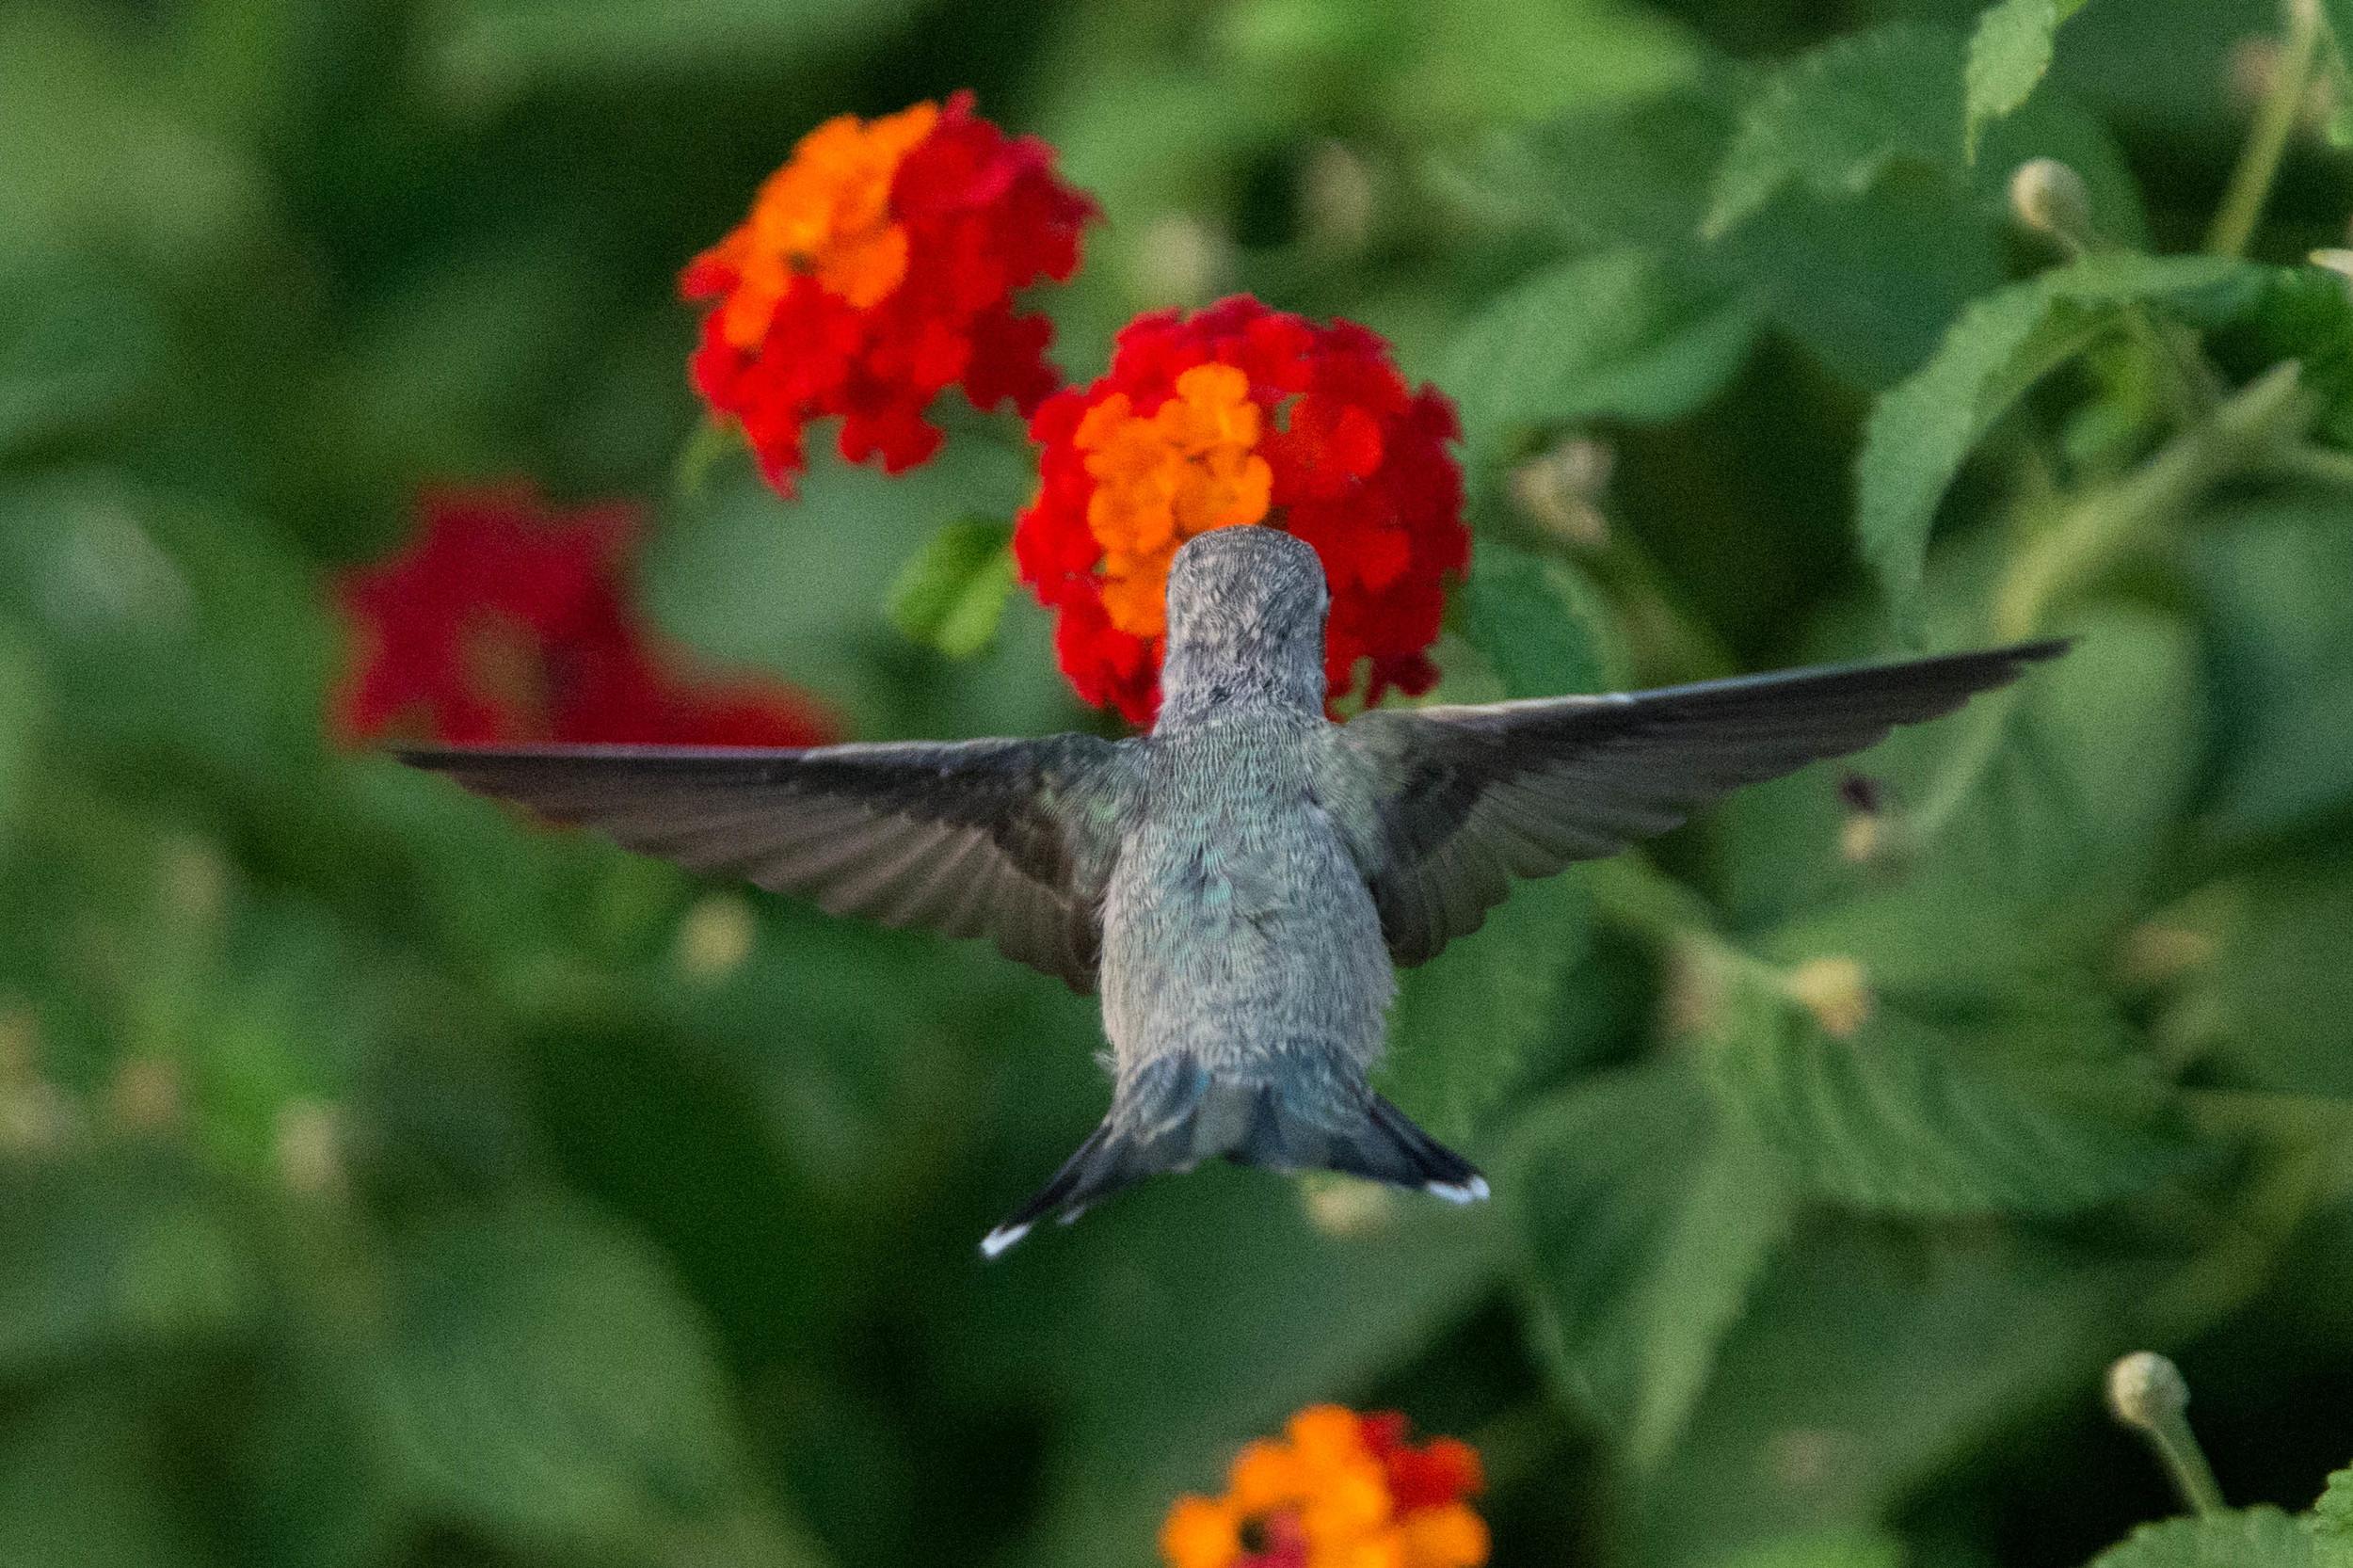 Female Hummingbird Docking